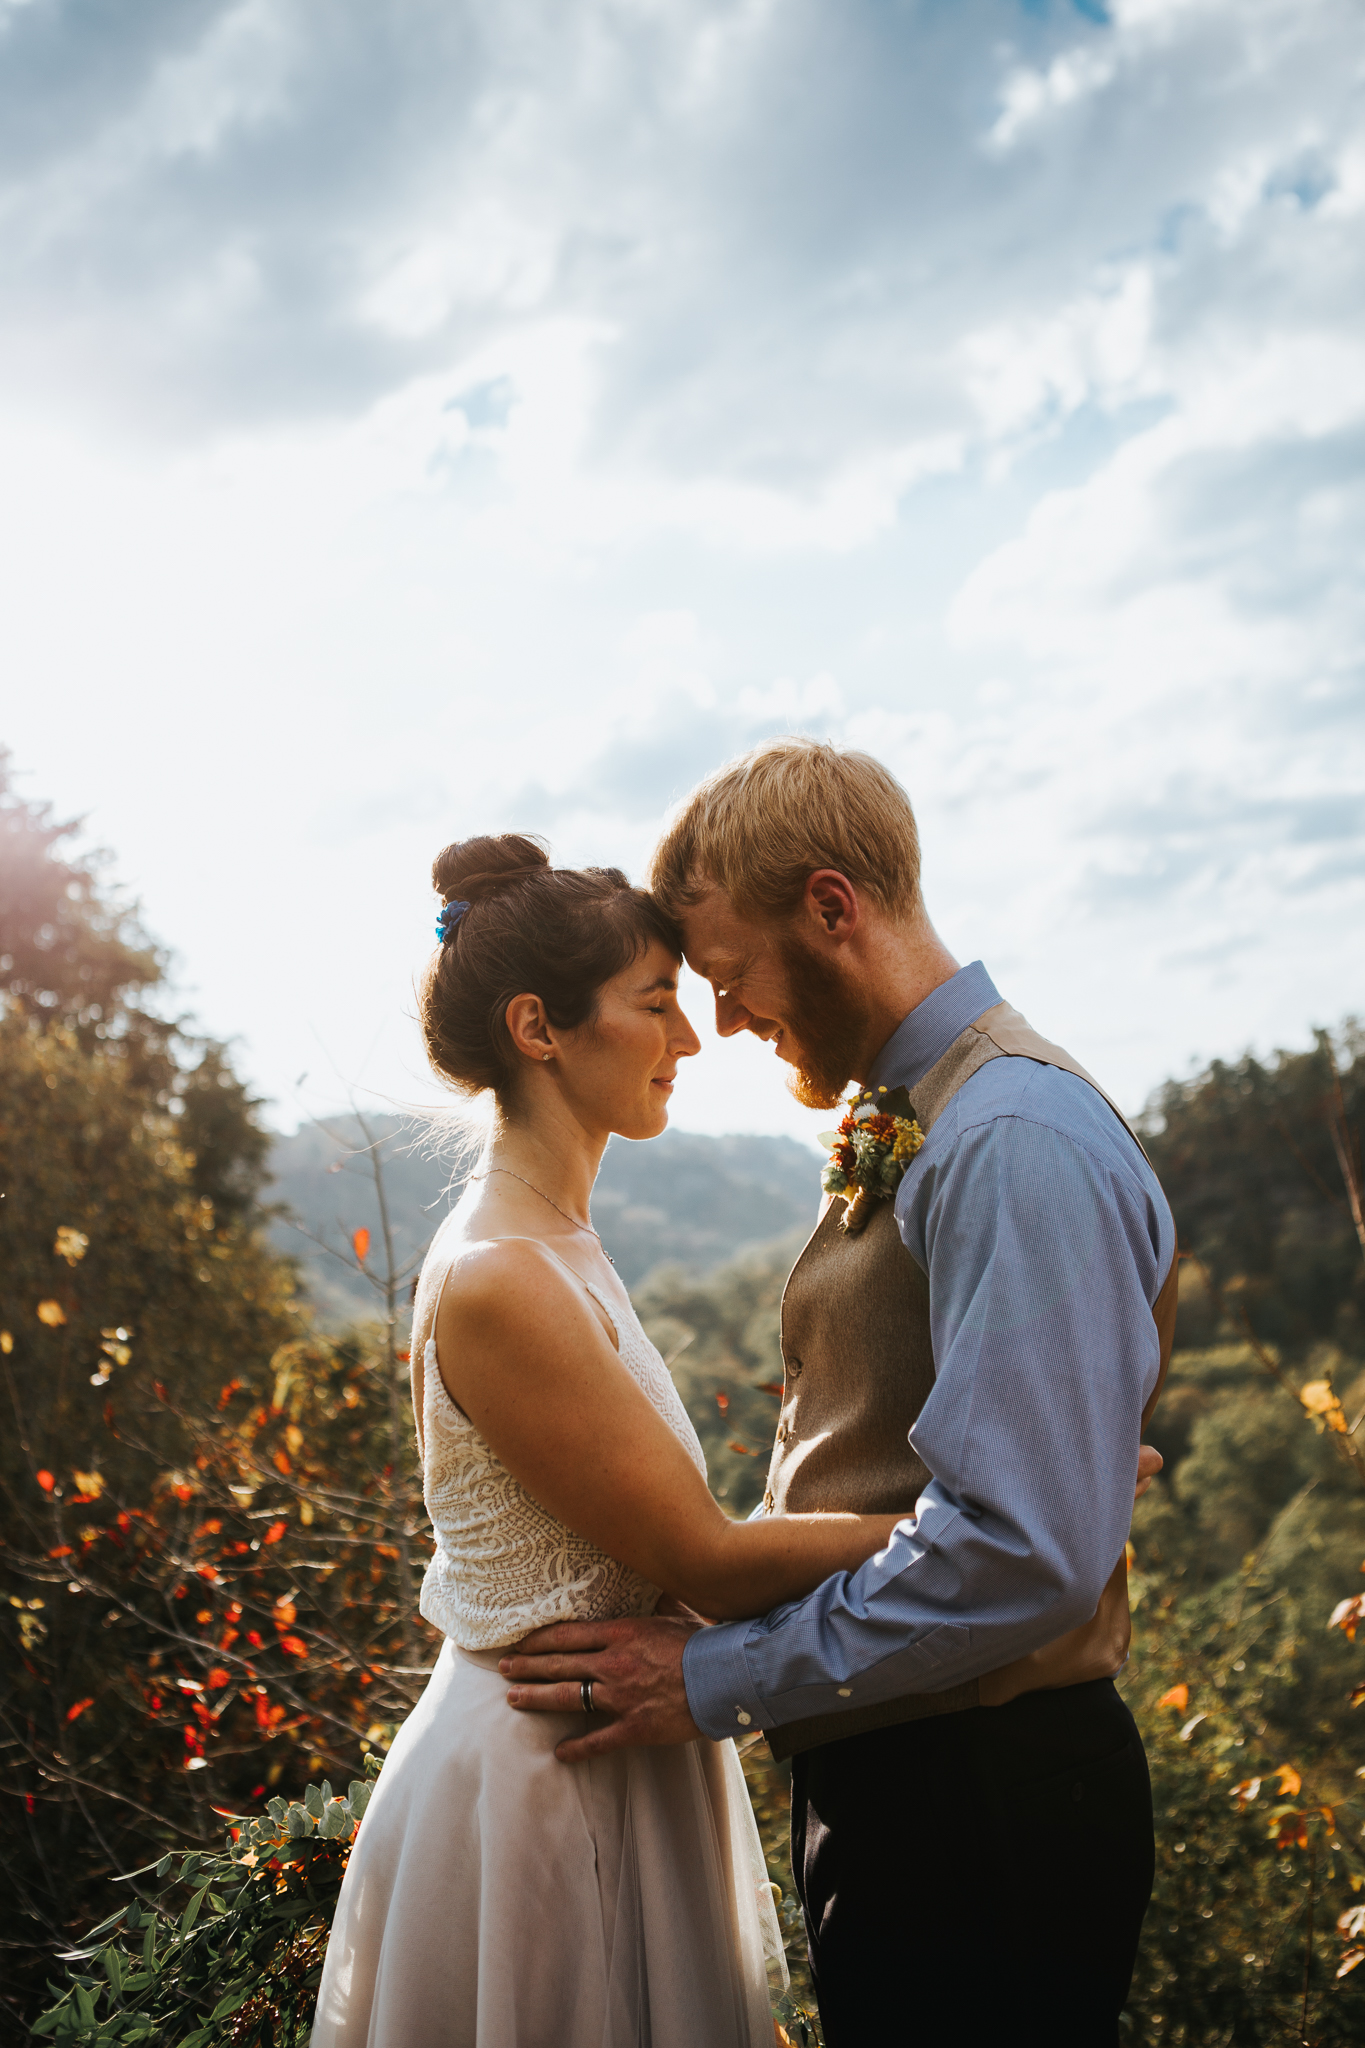 Richmond Kentucky Wedding Photographer - Ariana Jordan Photography -33.jpg